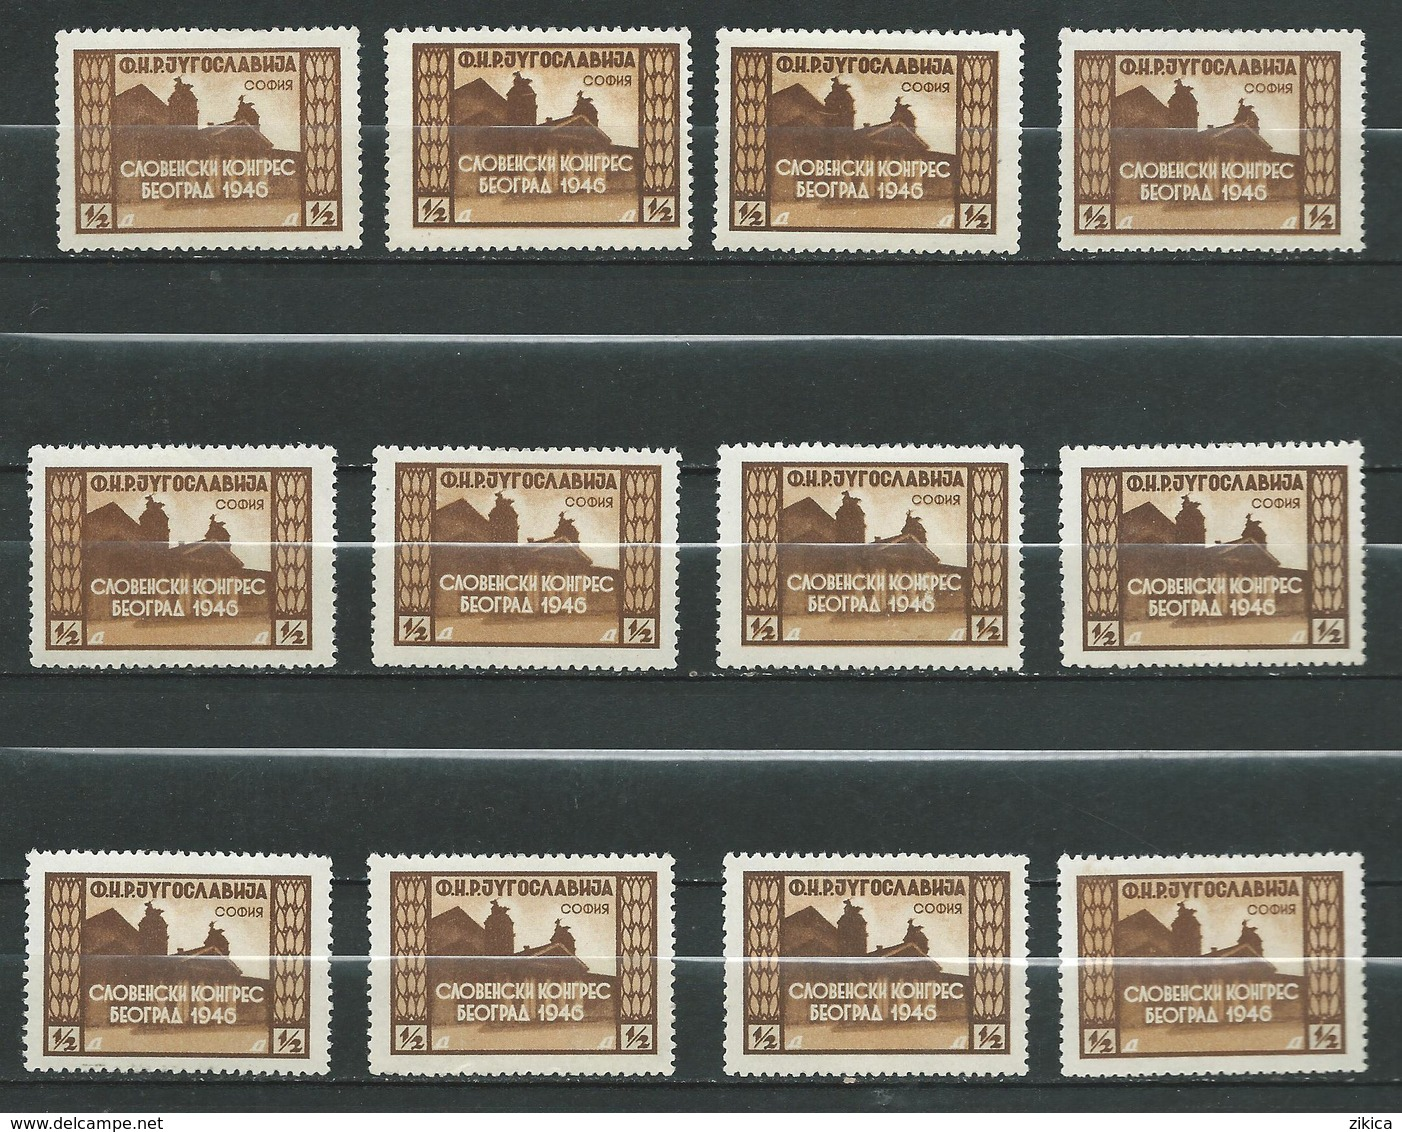 Yugoslavia 1948 Slav Congress - Lot 12 Stamps - National Theater In Sofia,Bulgaria - MNH** - 1945-1992 Socialist Federal Republic Of Yugoslavia